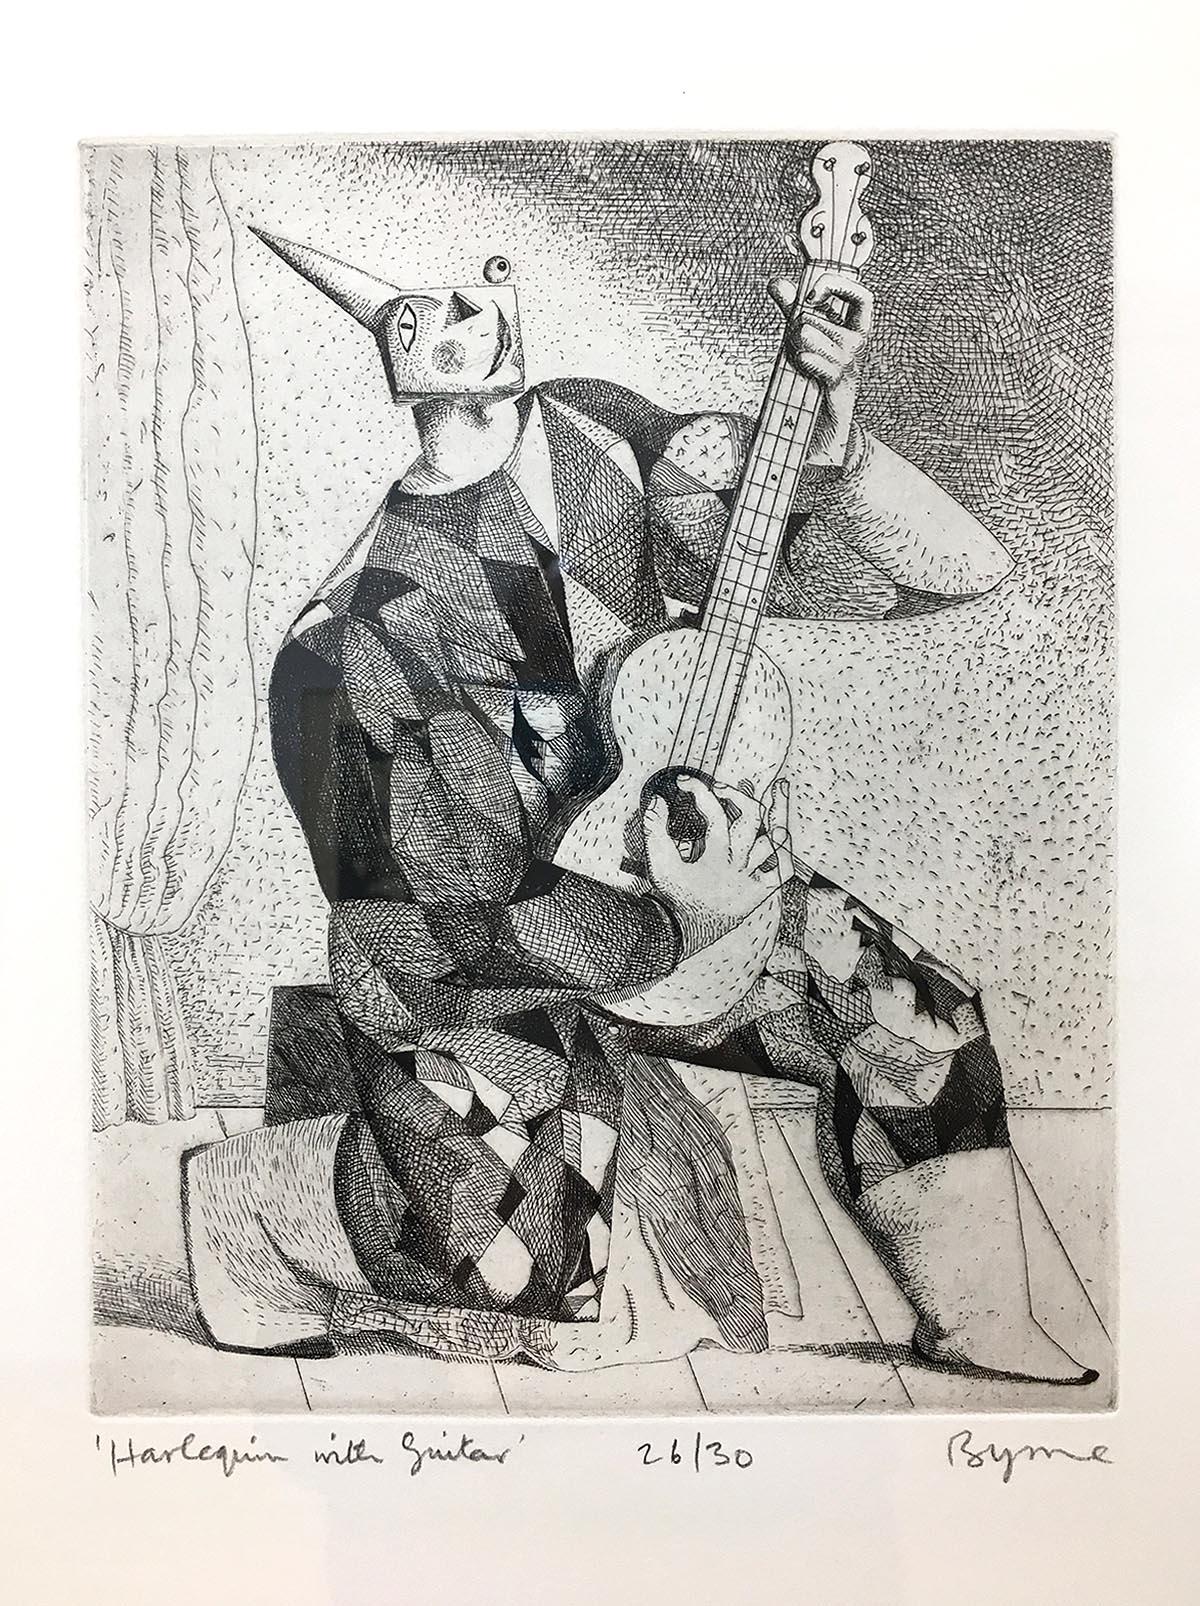 John Byrne, 'Harlequin with Guitar', etching.jpg